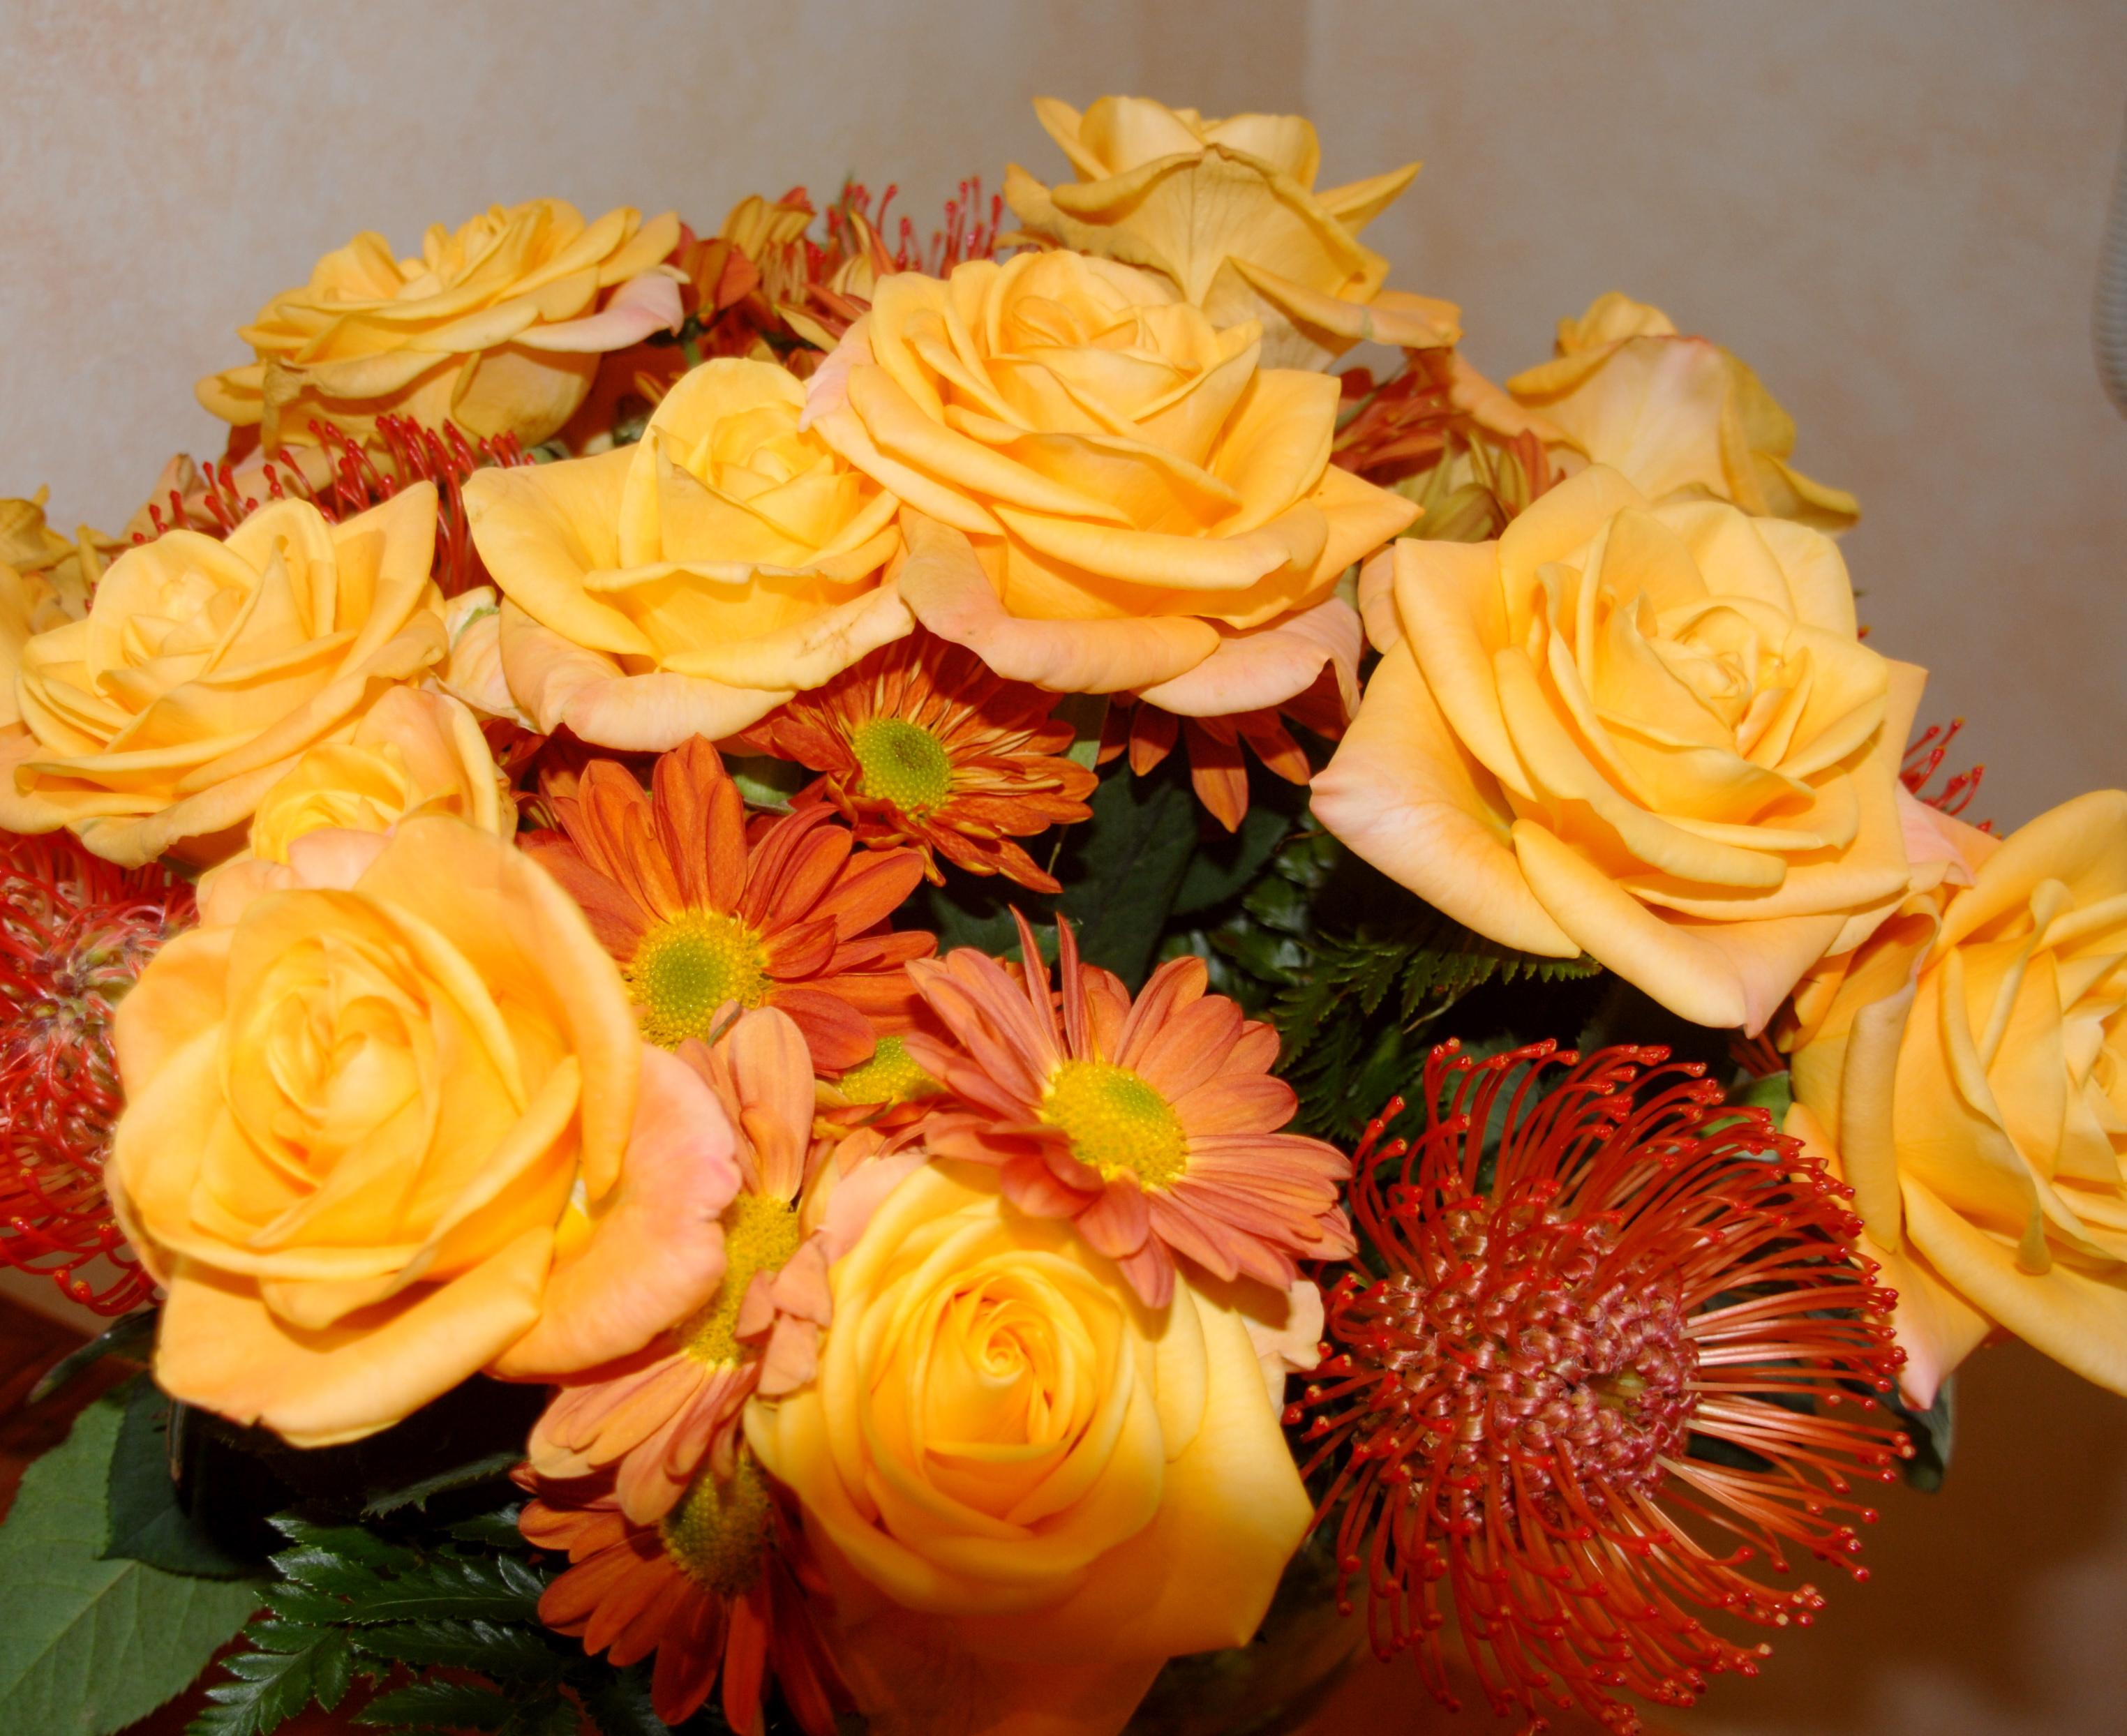 Fileyellow flower bouquet rosesg wikimedia commons fileyellow flower bouquet rosesg dhlflorist Gallery